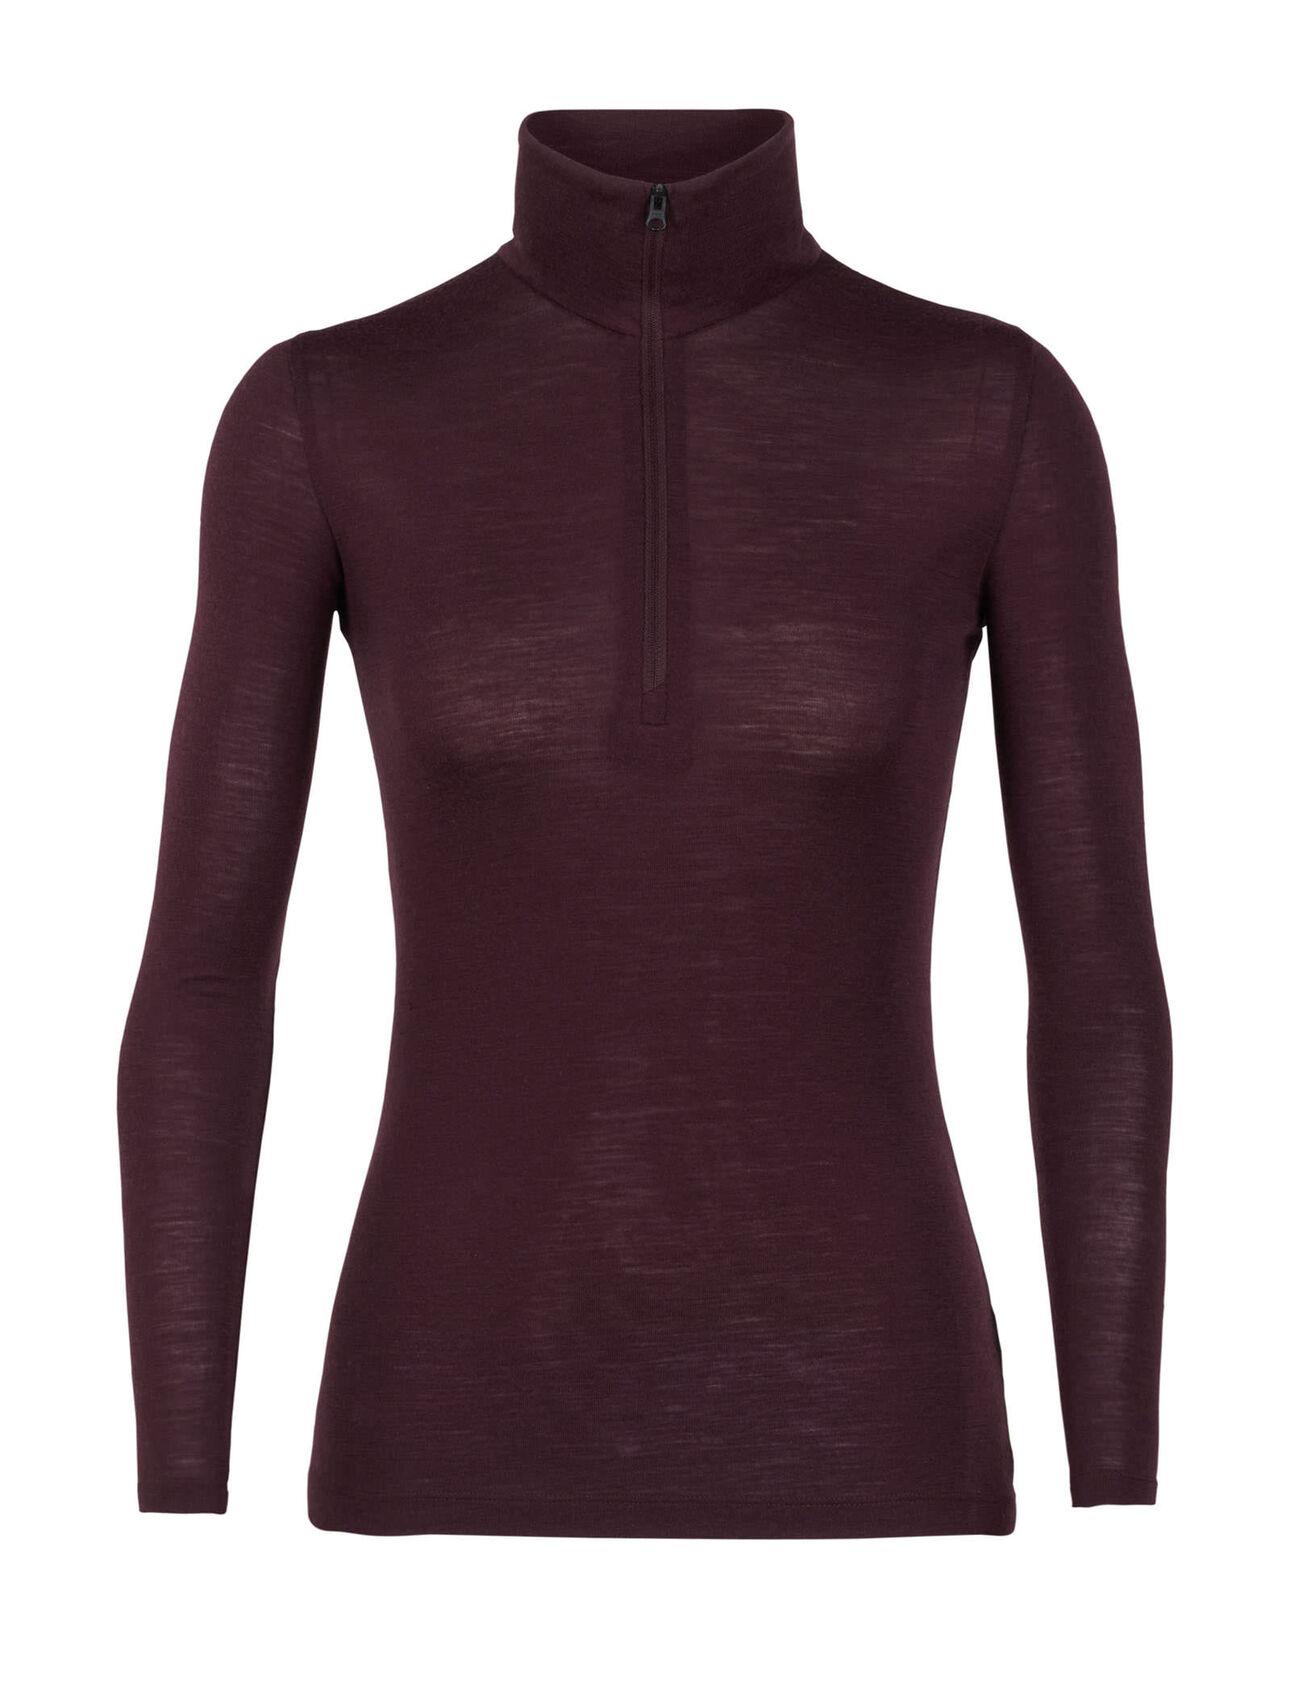 Merino 175 Everyday Long Sleeve Half Zip Damen ICEBREAKER 175 g//m² Merino